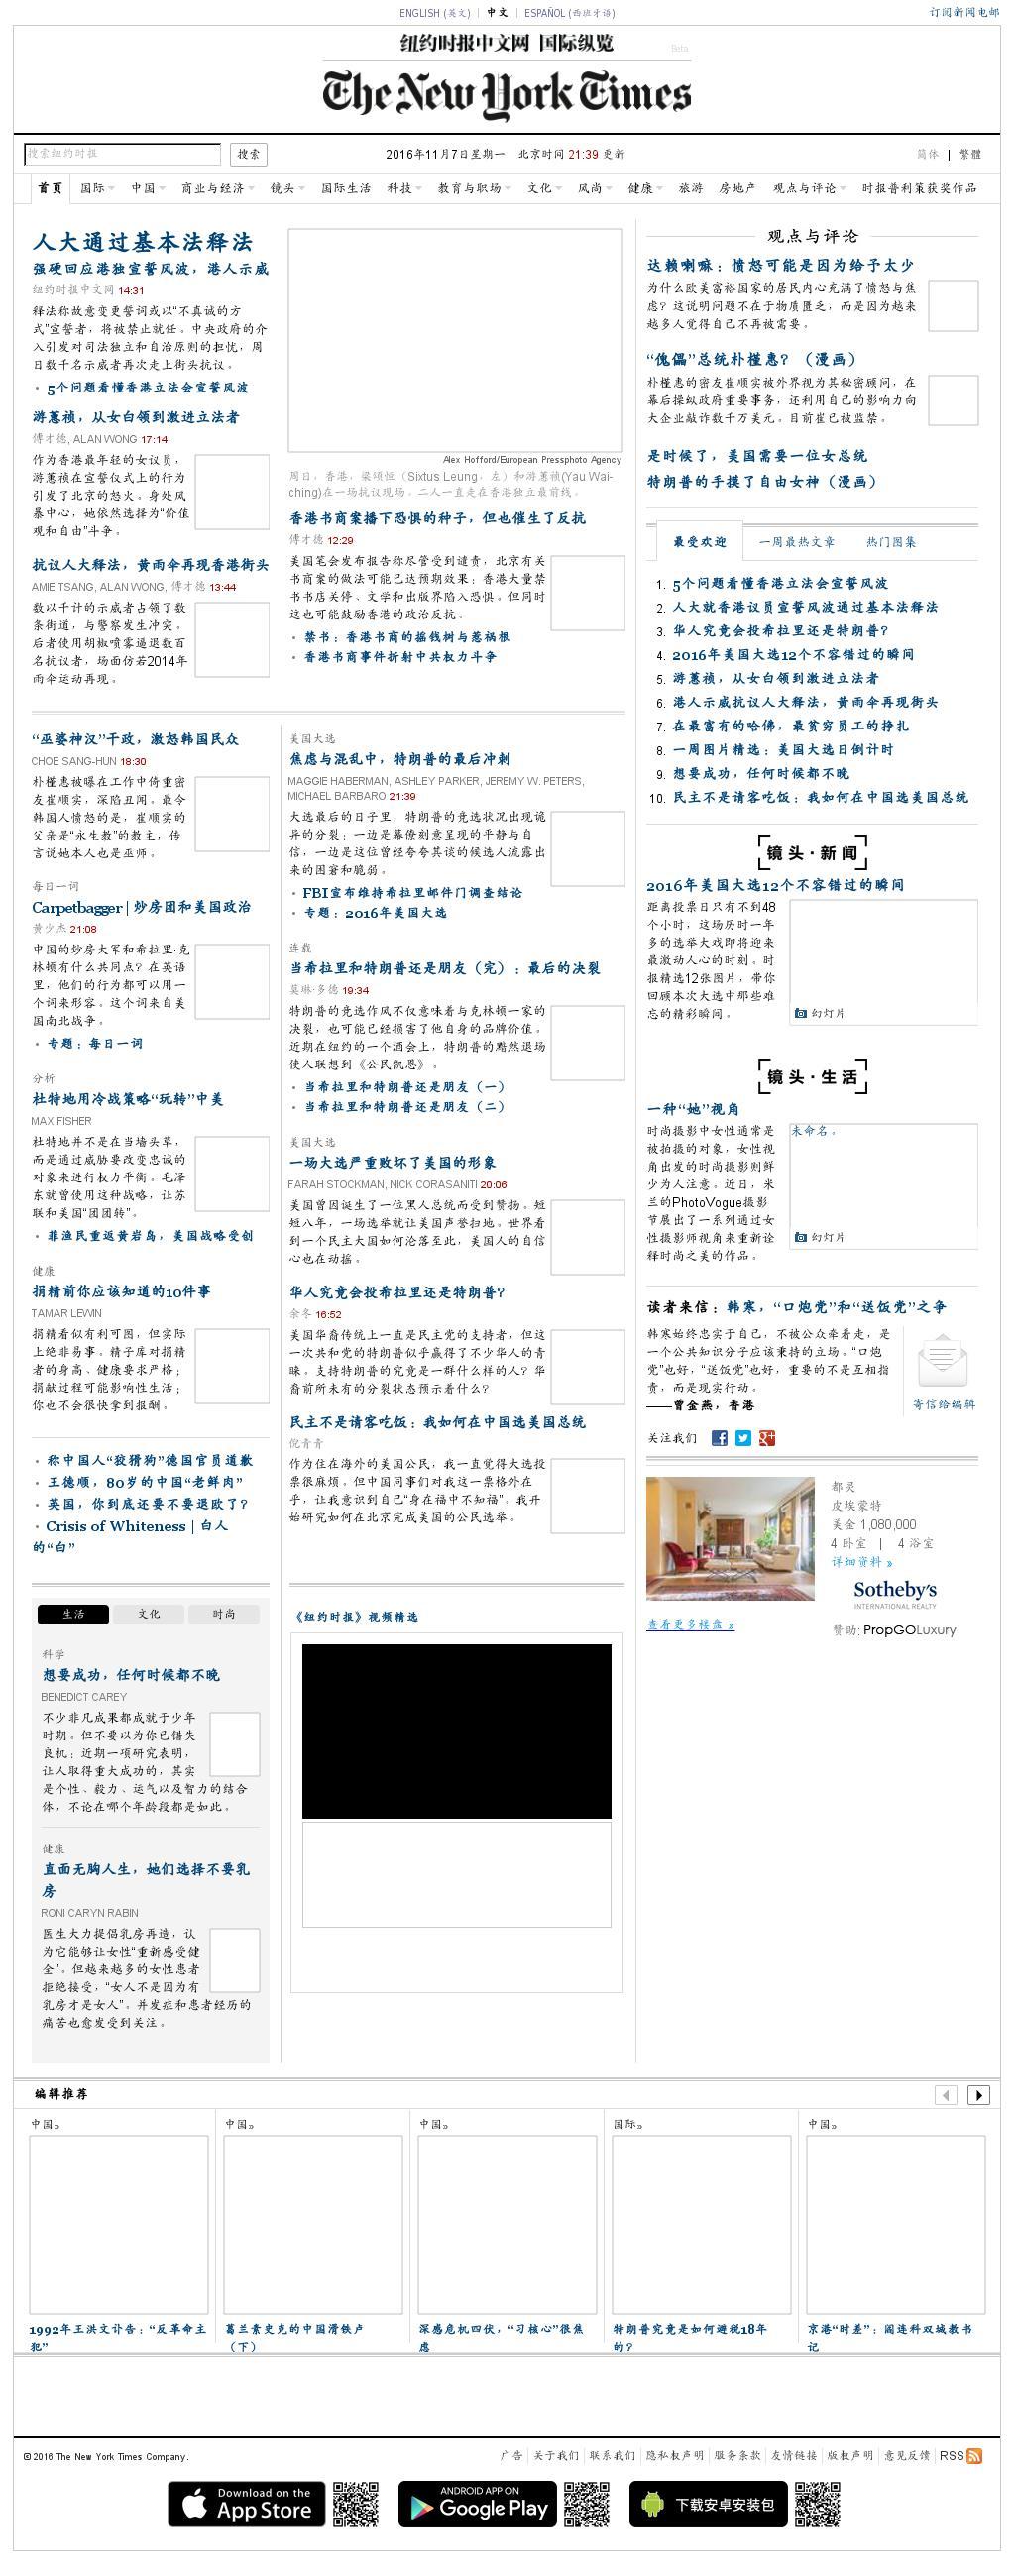 The New York Times (Chinese) at Monday Nov. 7, 2016, 4:12 p.m. UTC